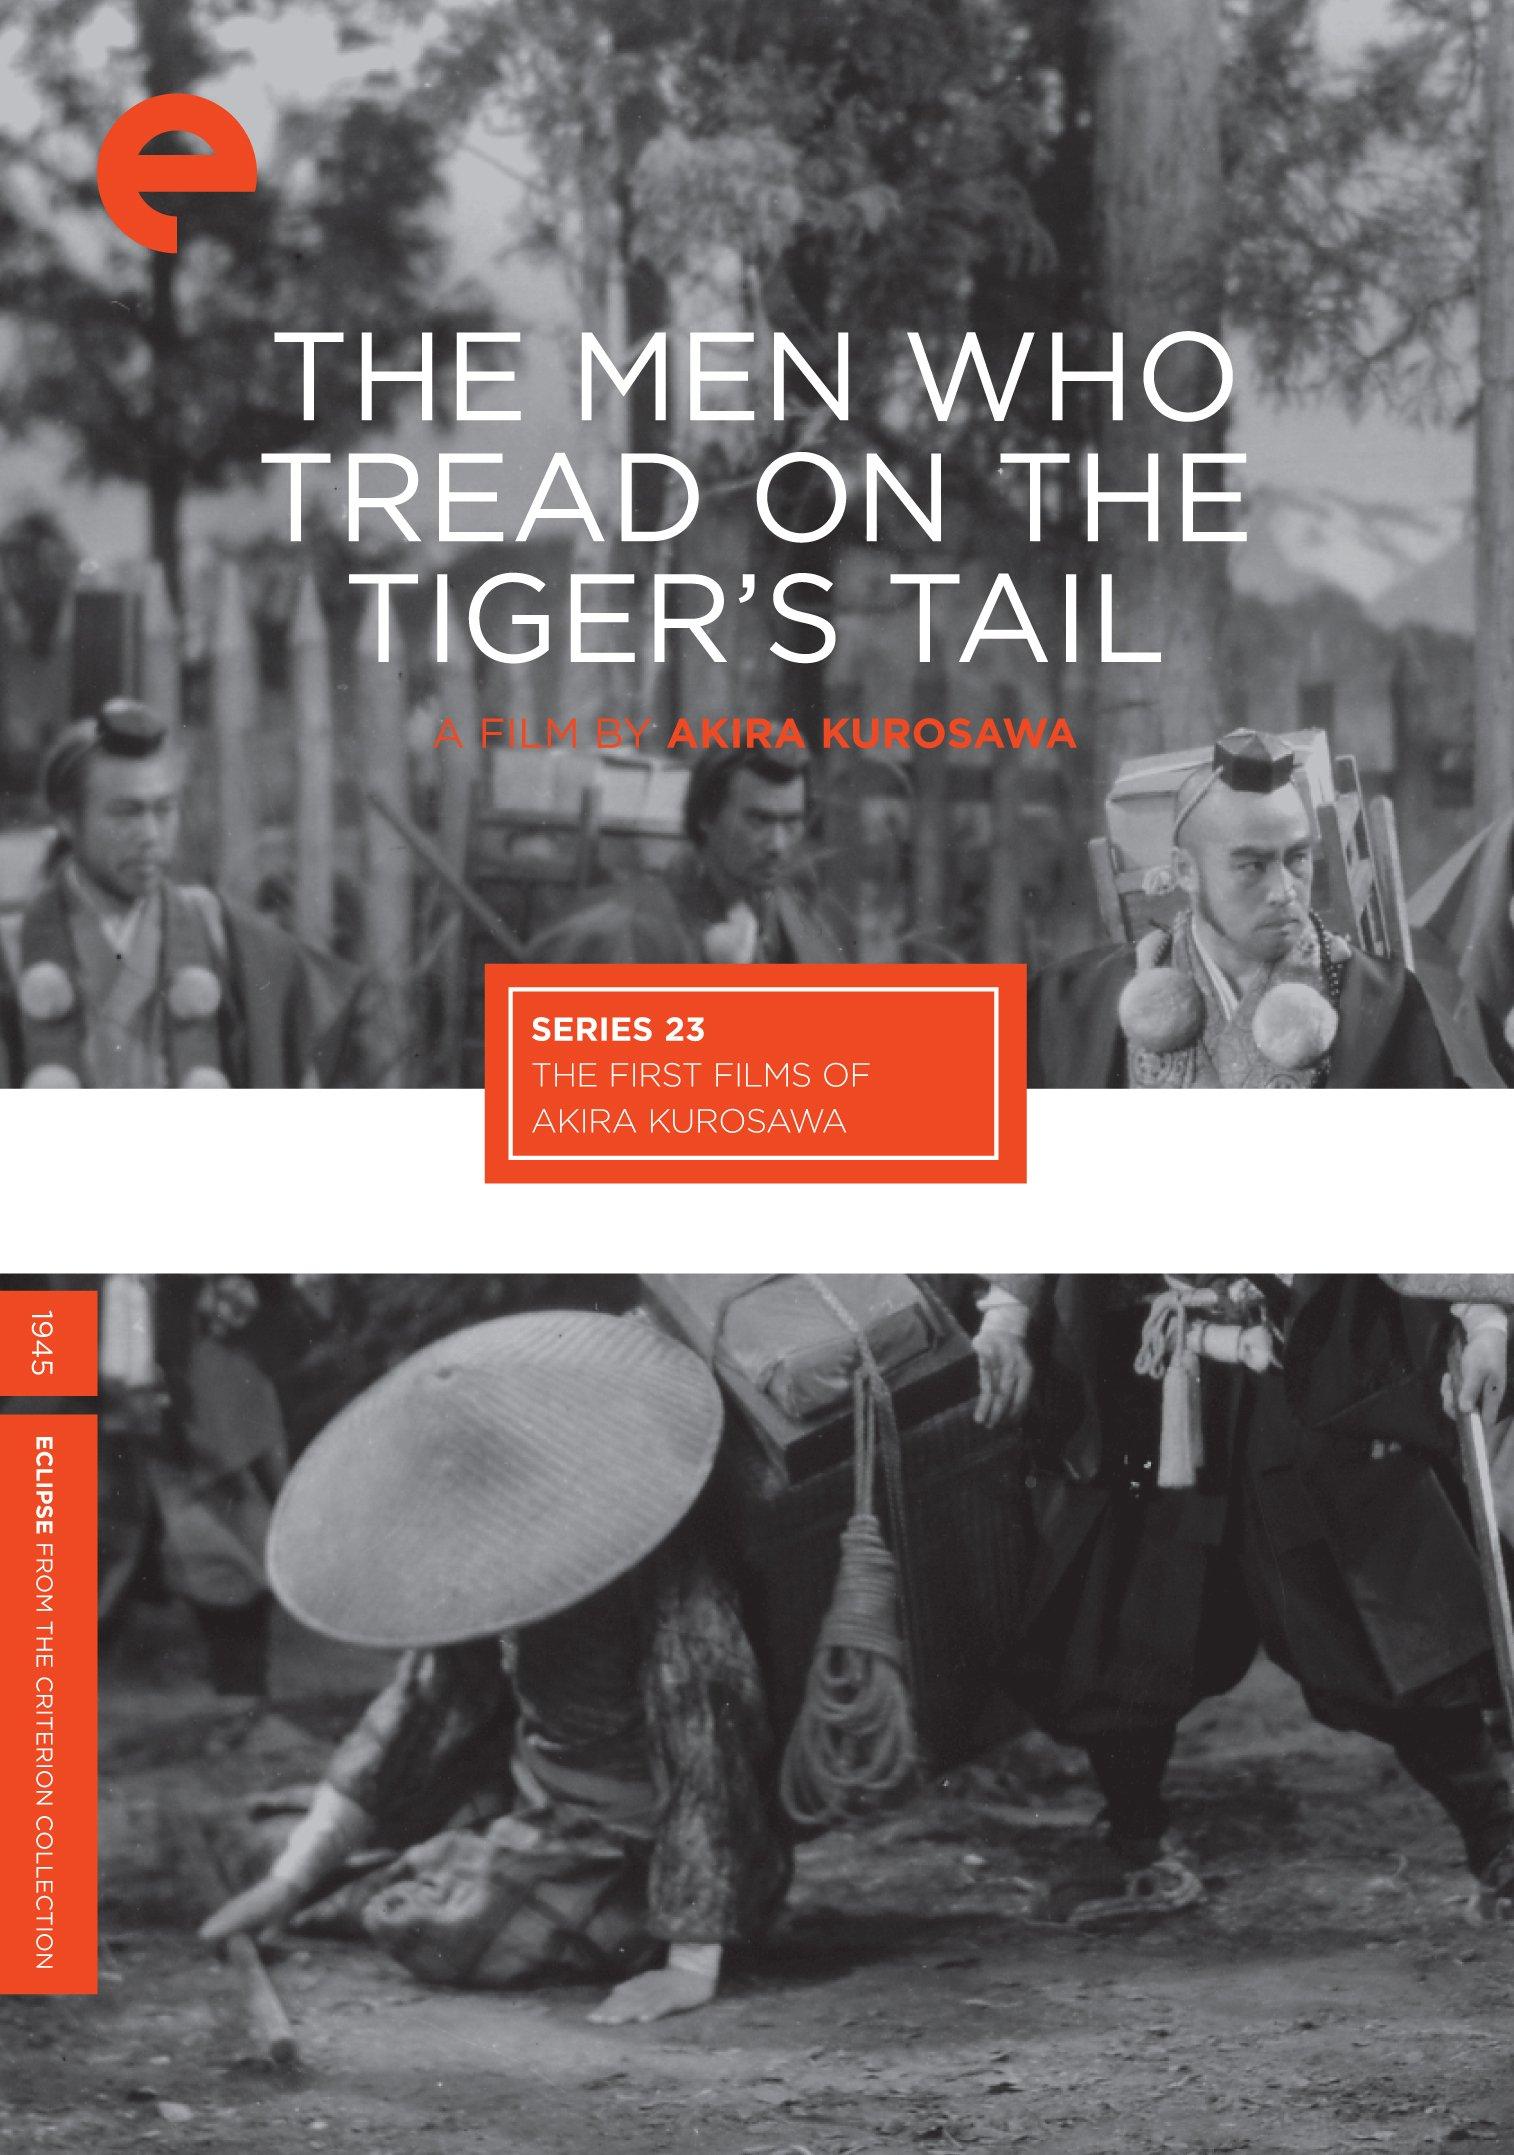 Eclipse Series 23: The First Films of Akira Kurosawa (Sanshiro Sugata / The Most Beautiful / Sanshiro Sugata, Part Two / The Men Who Tread on the Tiger's Tail) (The Criterion Collection)